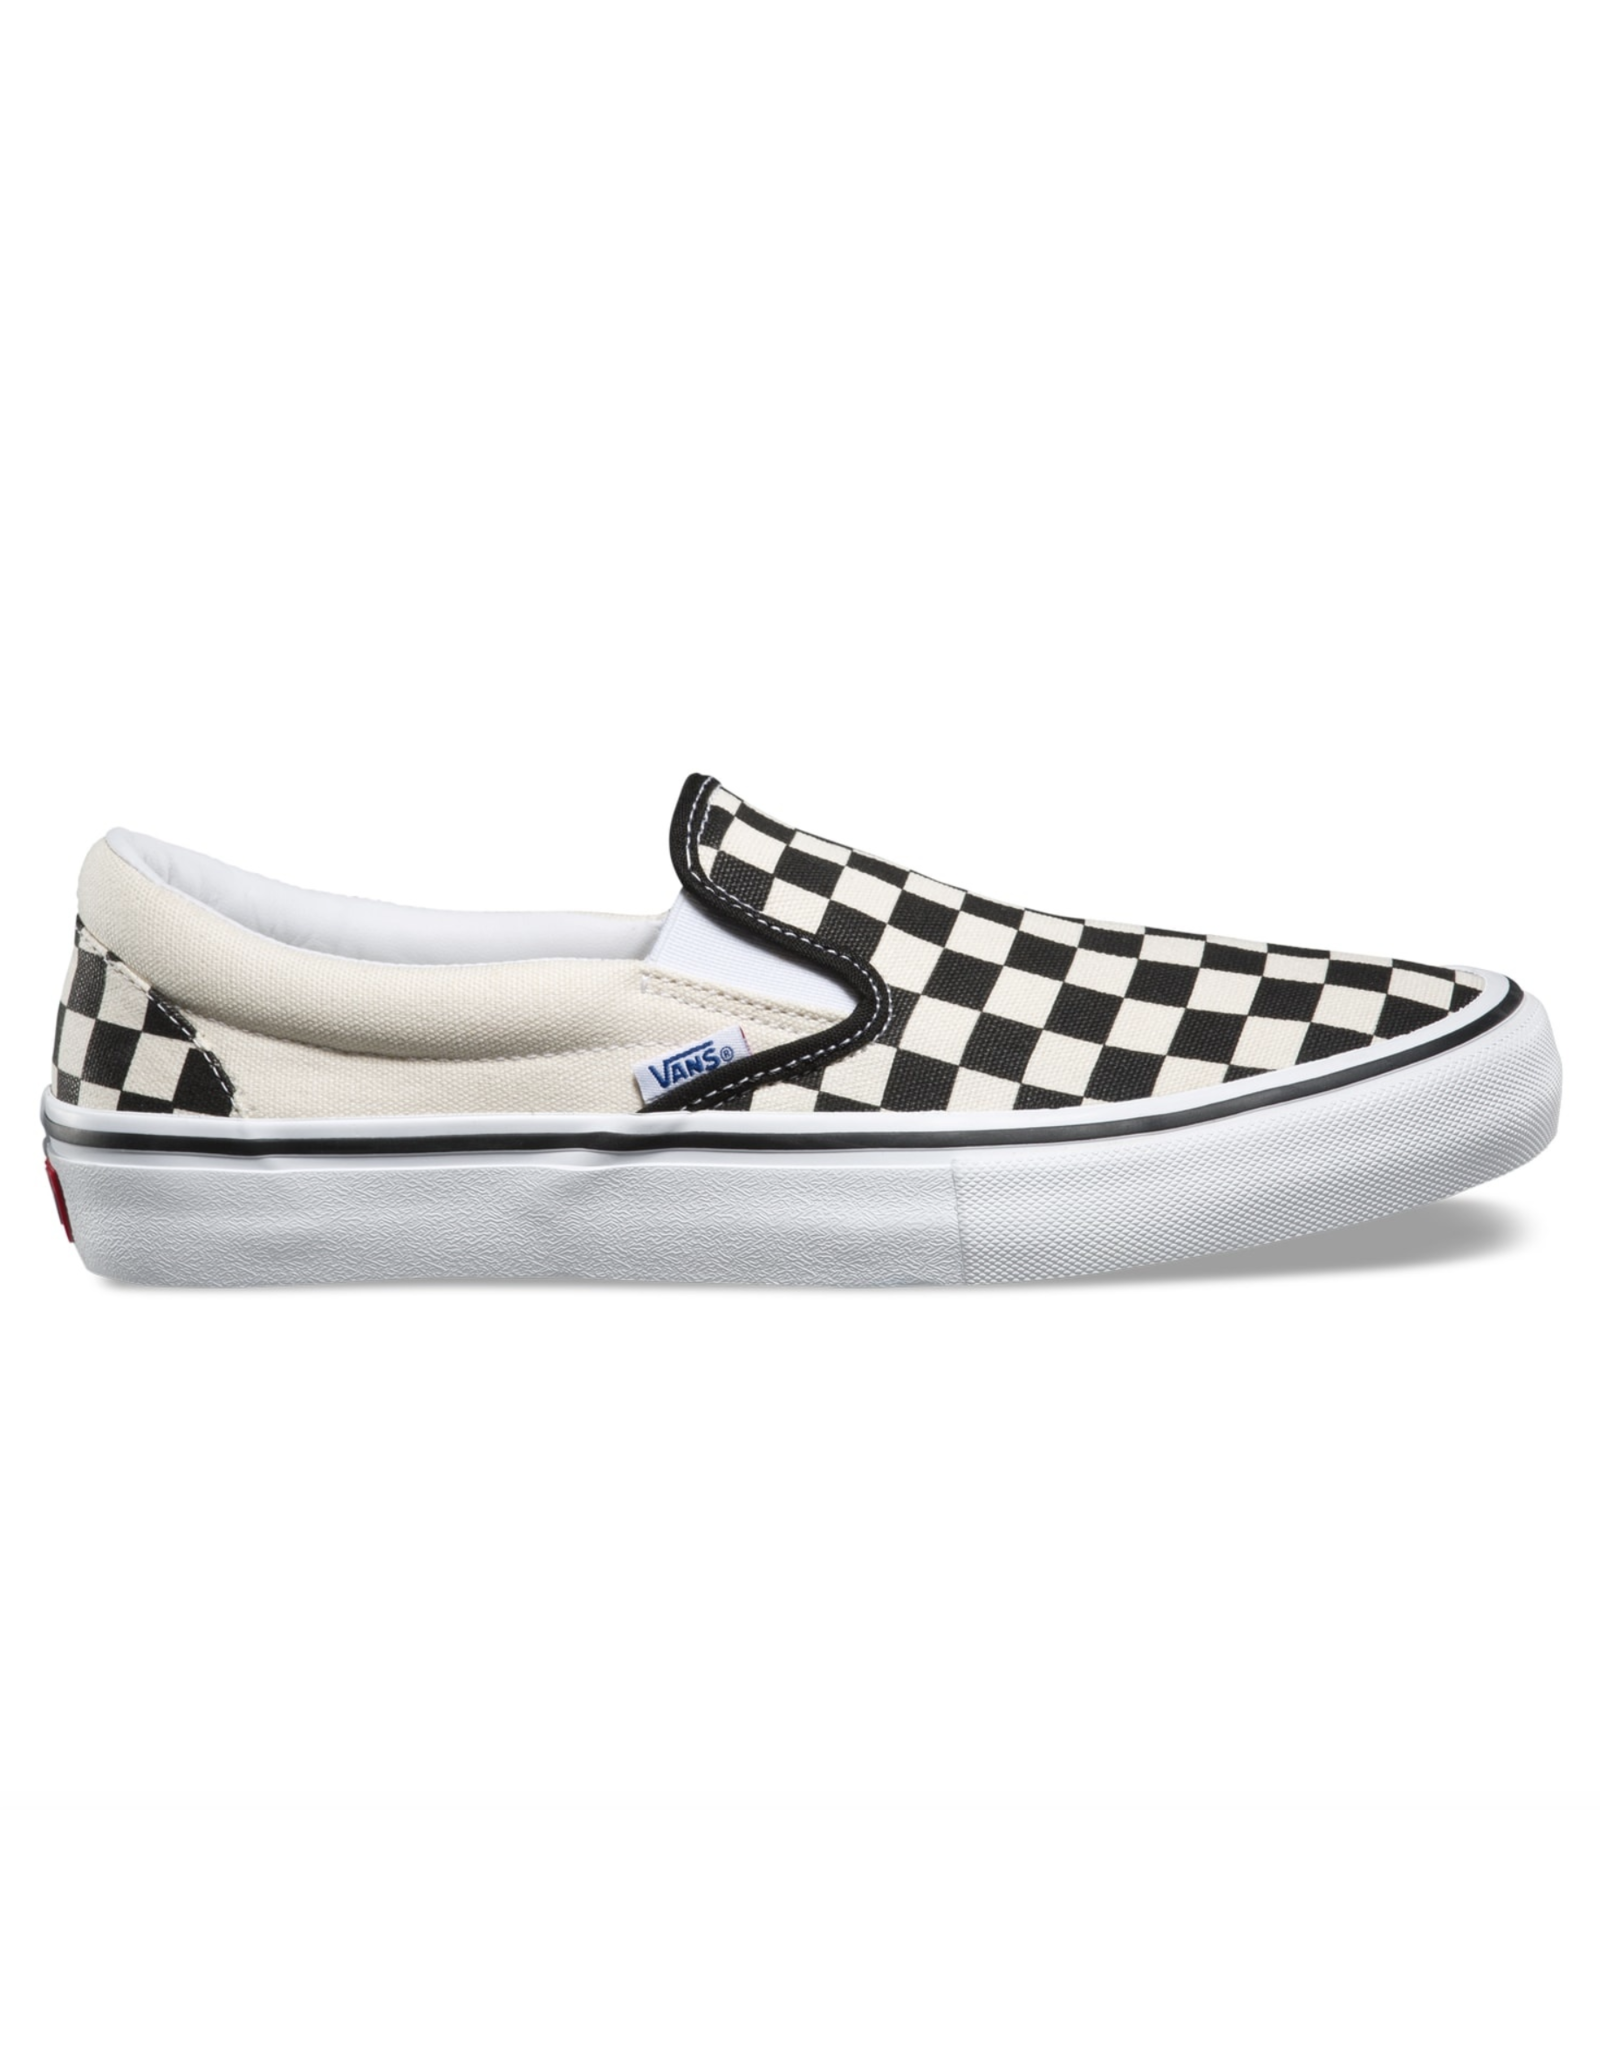 Vans Slip-On Pro - Checkerboard